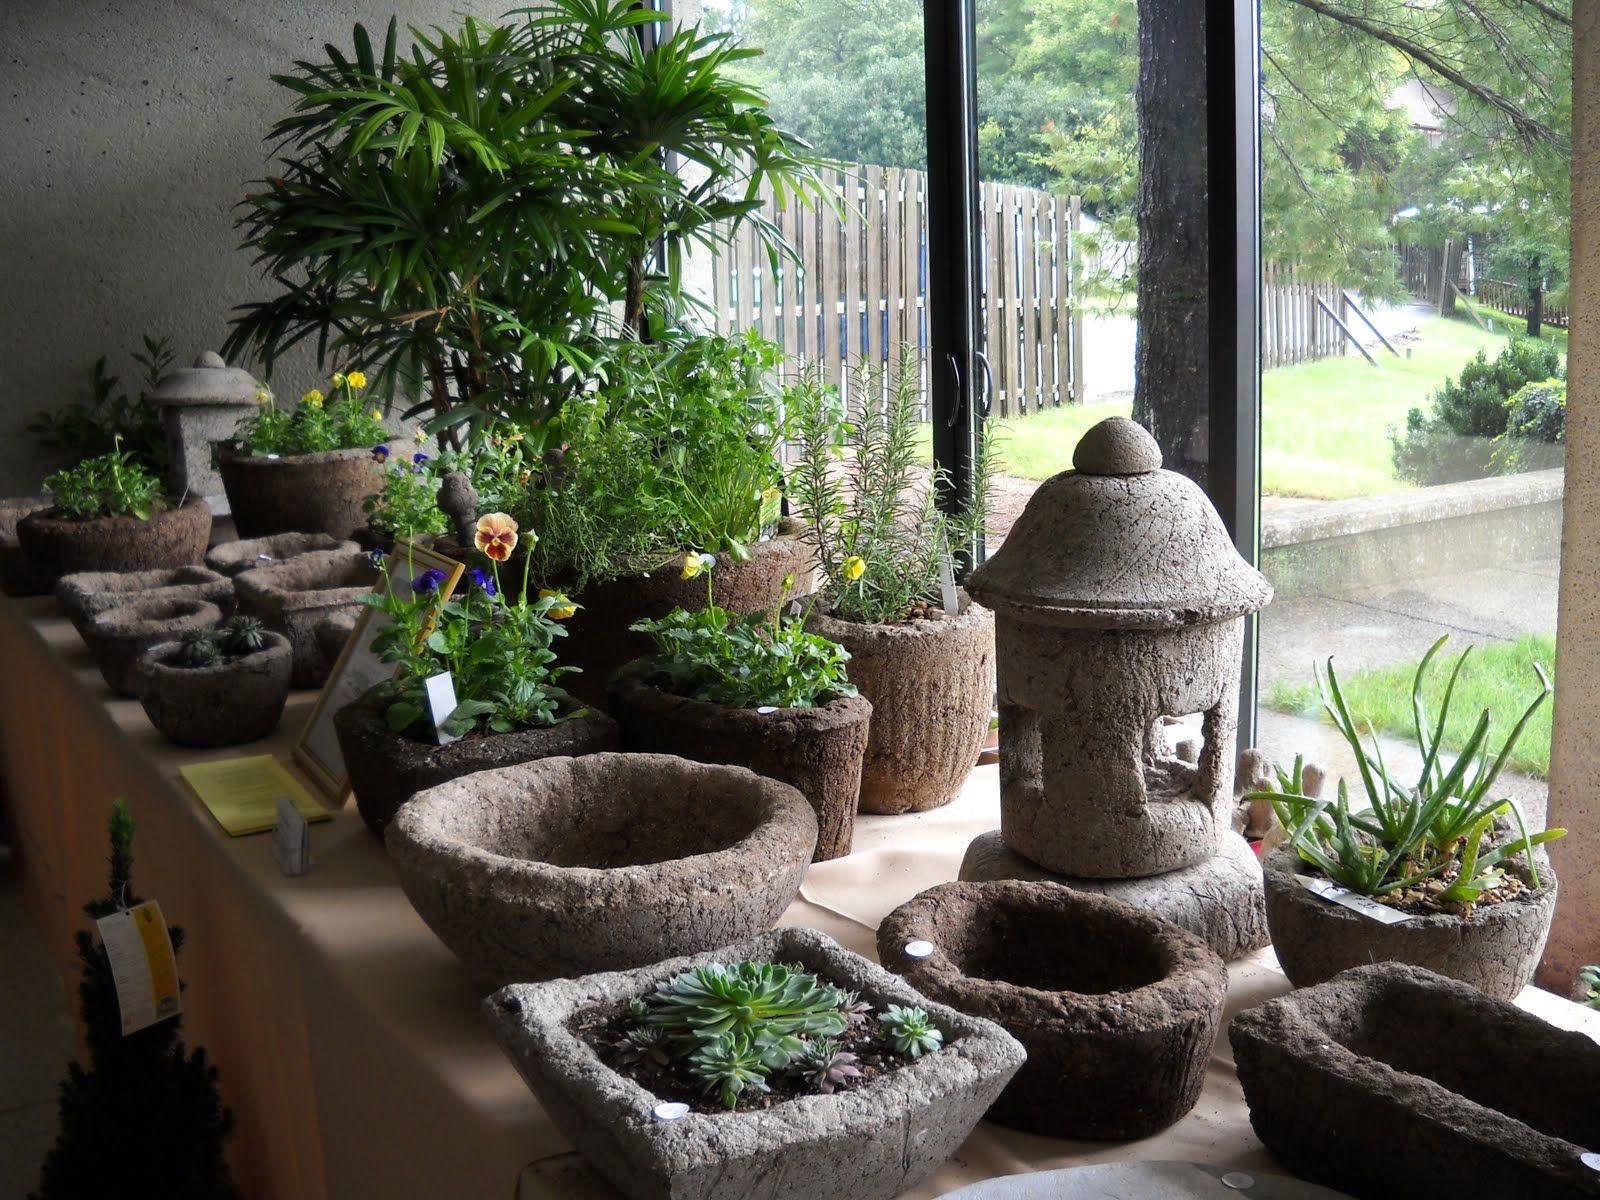 STONE ARTISANS Garden Ornaments And Planters: Hypertufa Planters, Bird  Baths, Lanterns At The